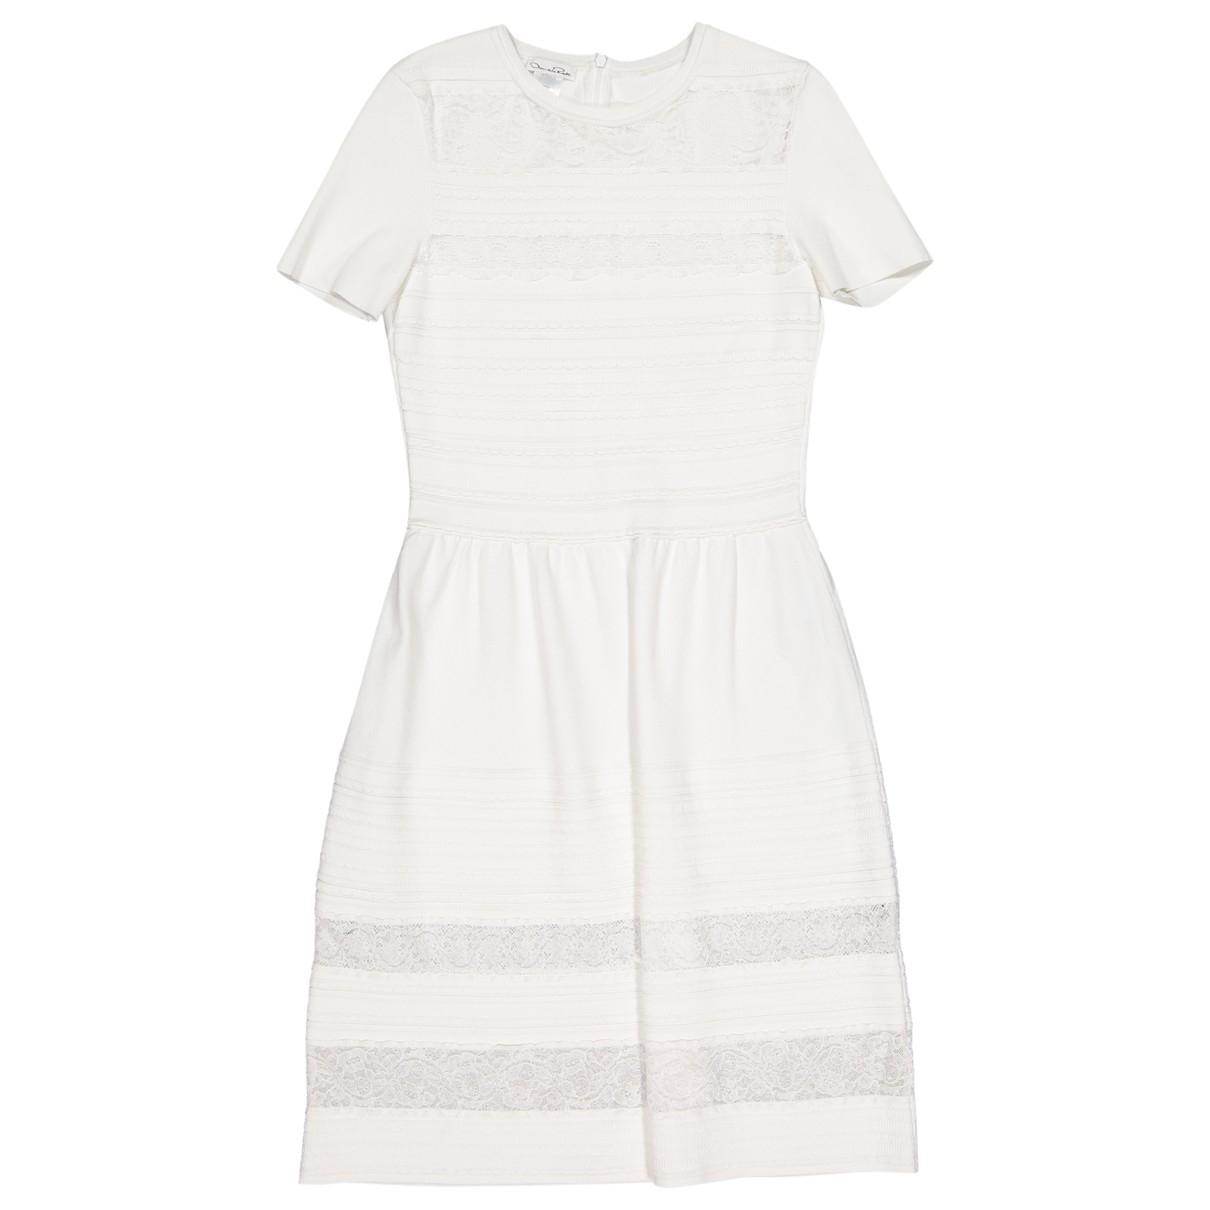 Oscar De La Renta \N White dress for Women 38 FR